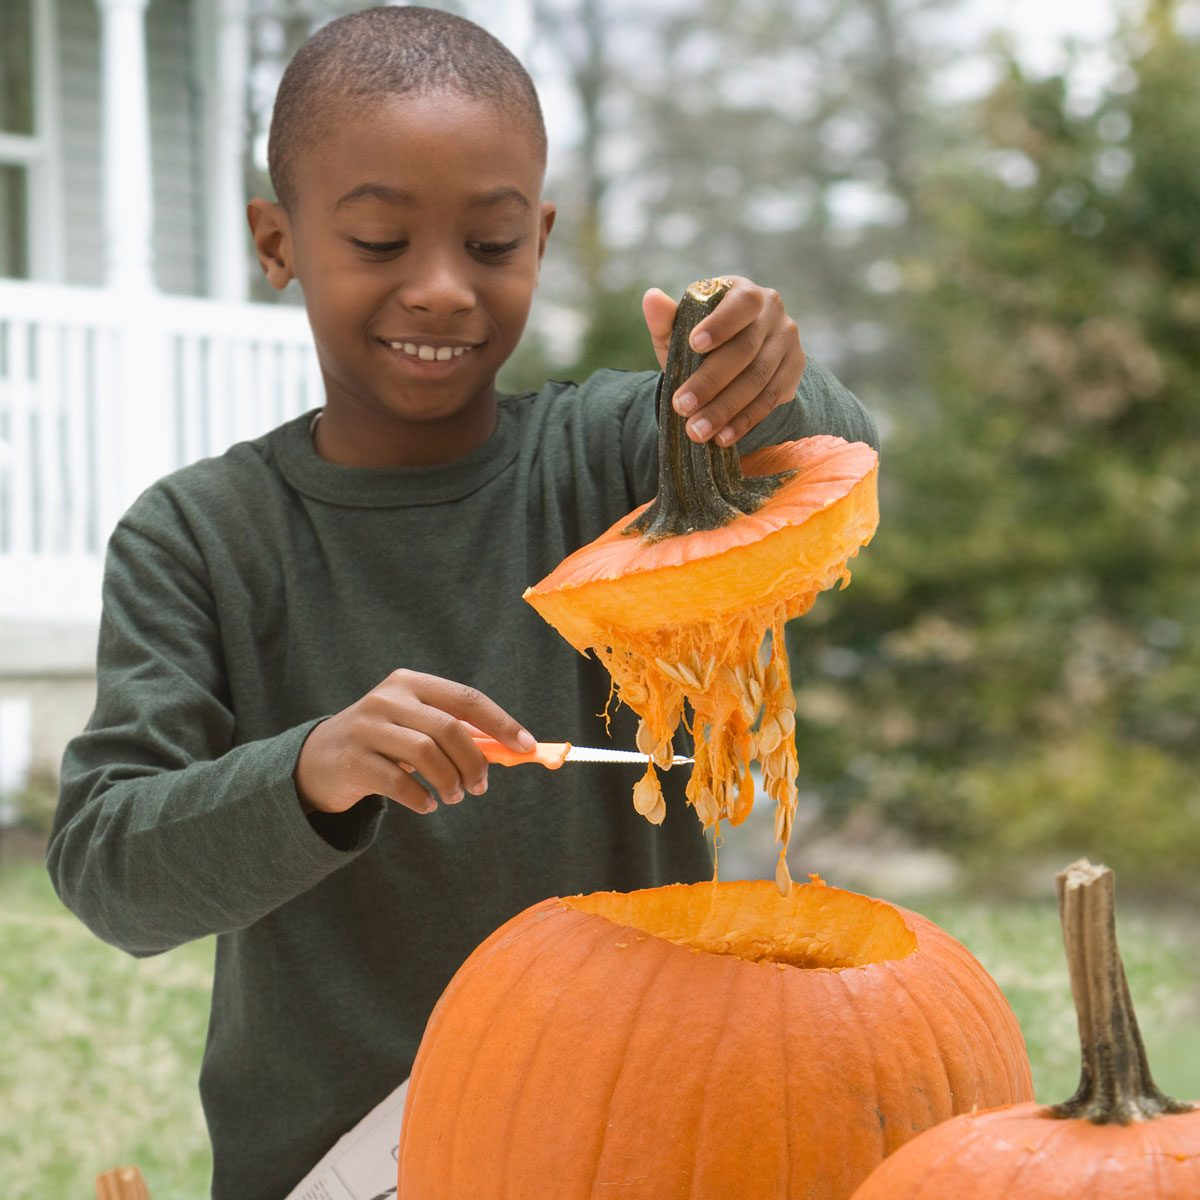 Kid carving a pumpkin